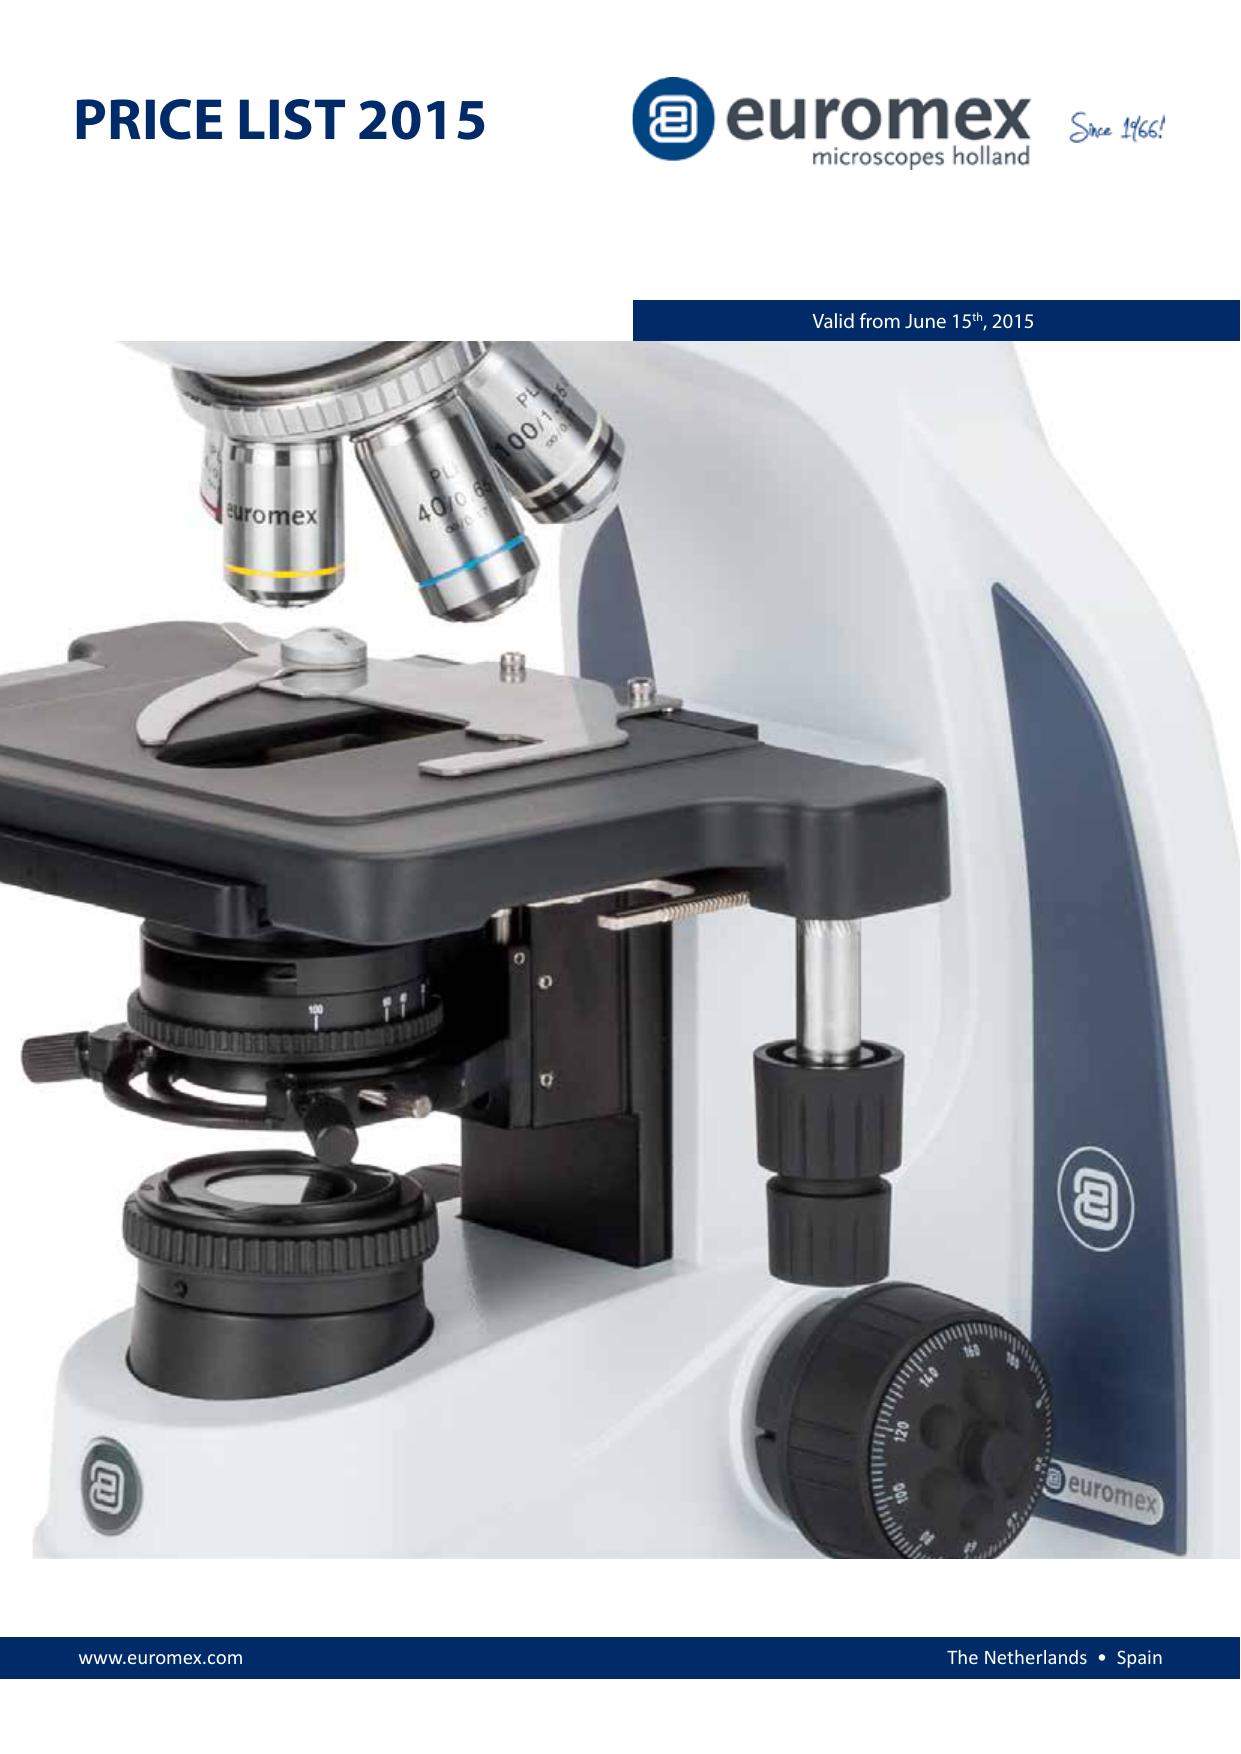 10x//20x//30x Euromex ED.1502-S EduBlue Binocular Stereo Microscope Rack and Pinion Stand